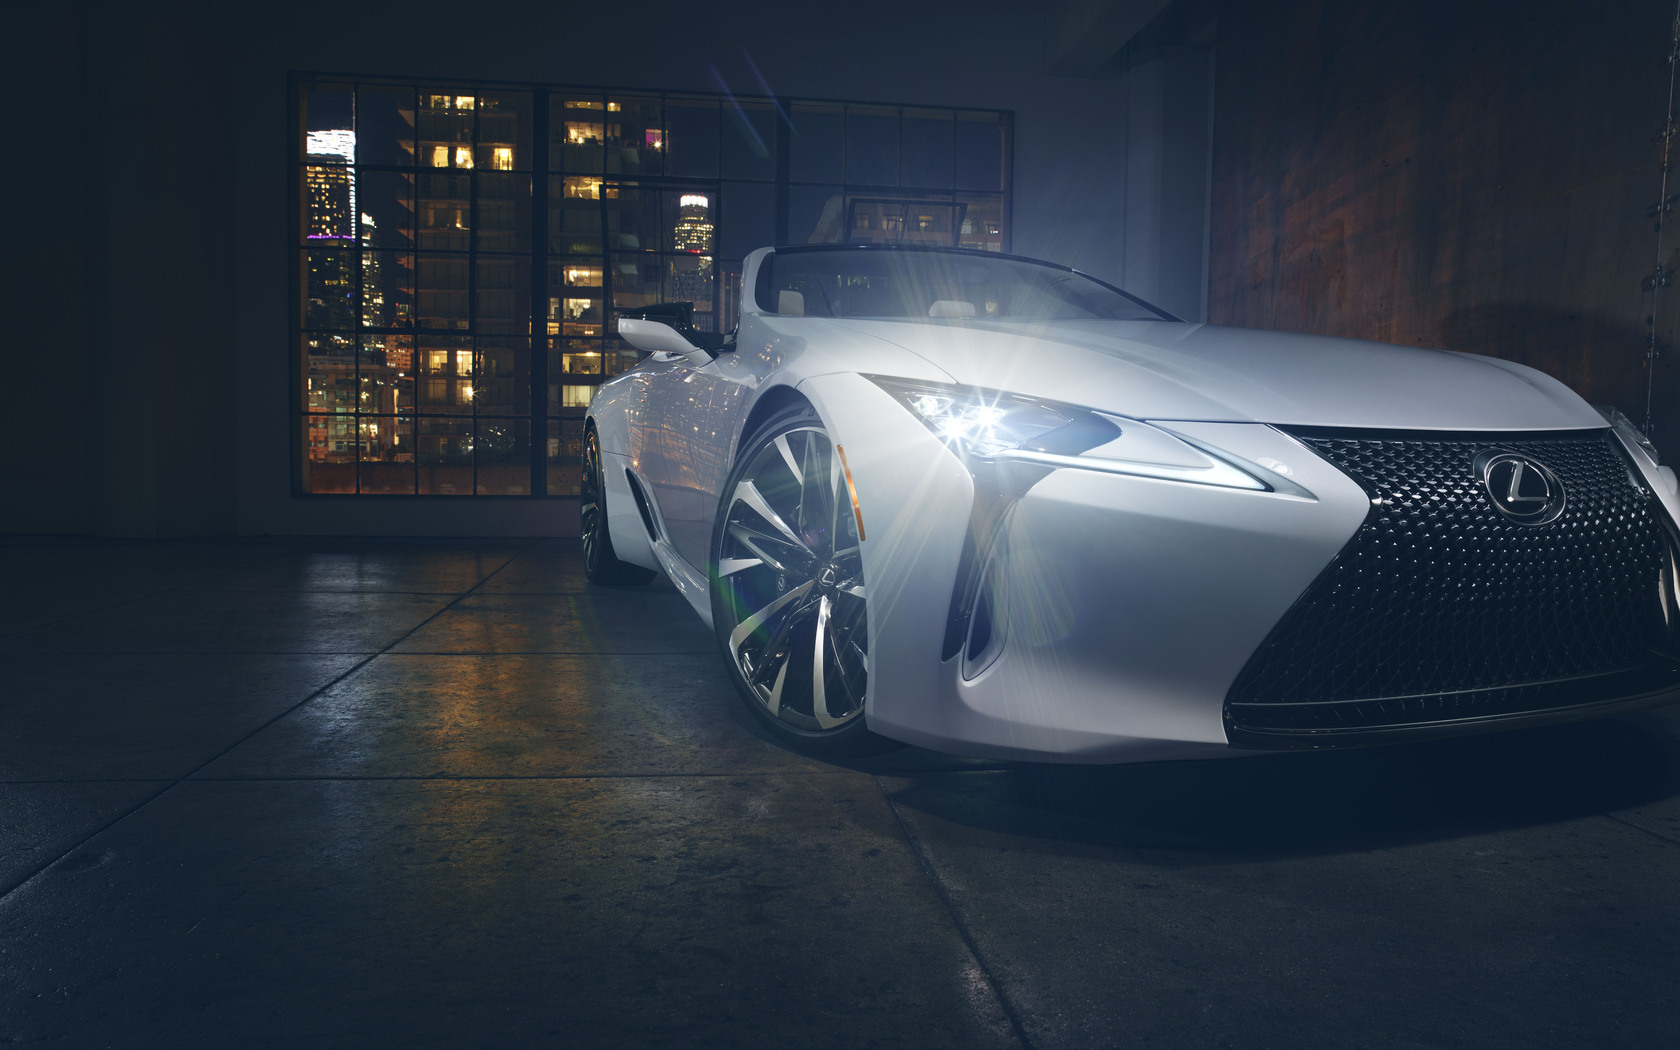 lexus-lc-convertible-concept-2019-12k-ni.jpg